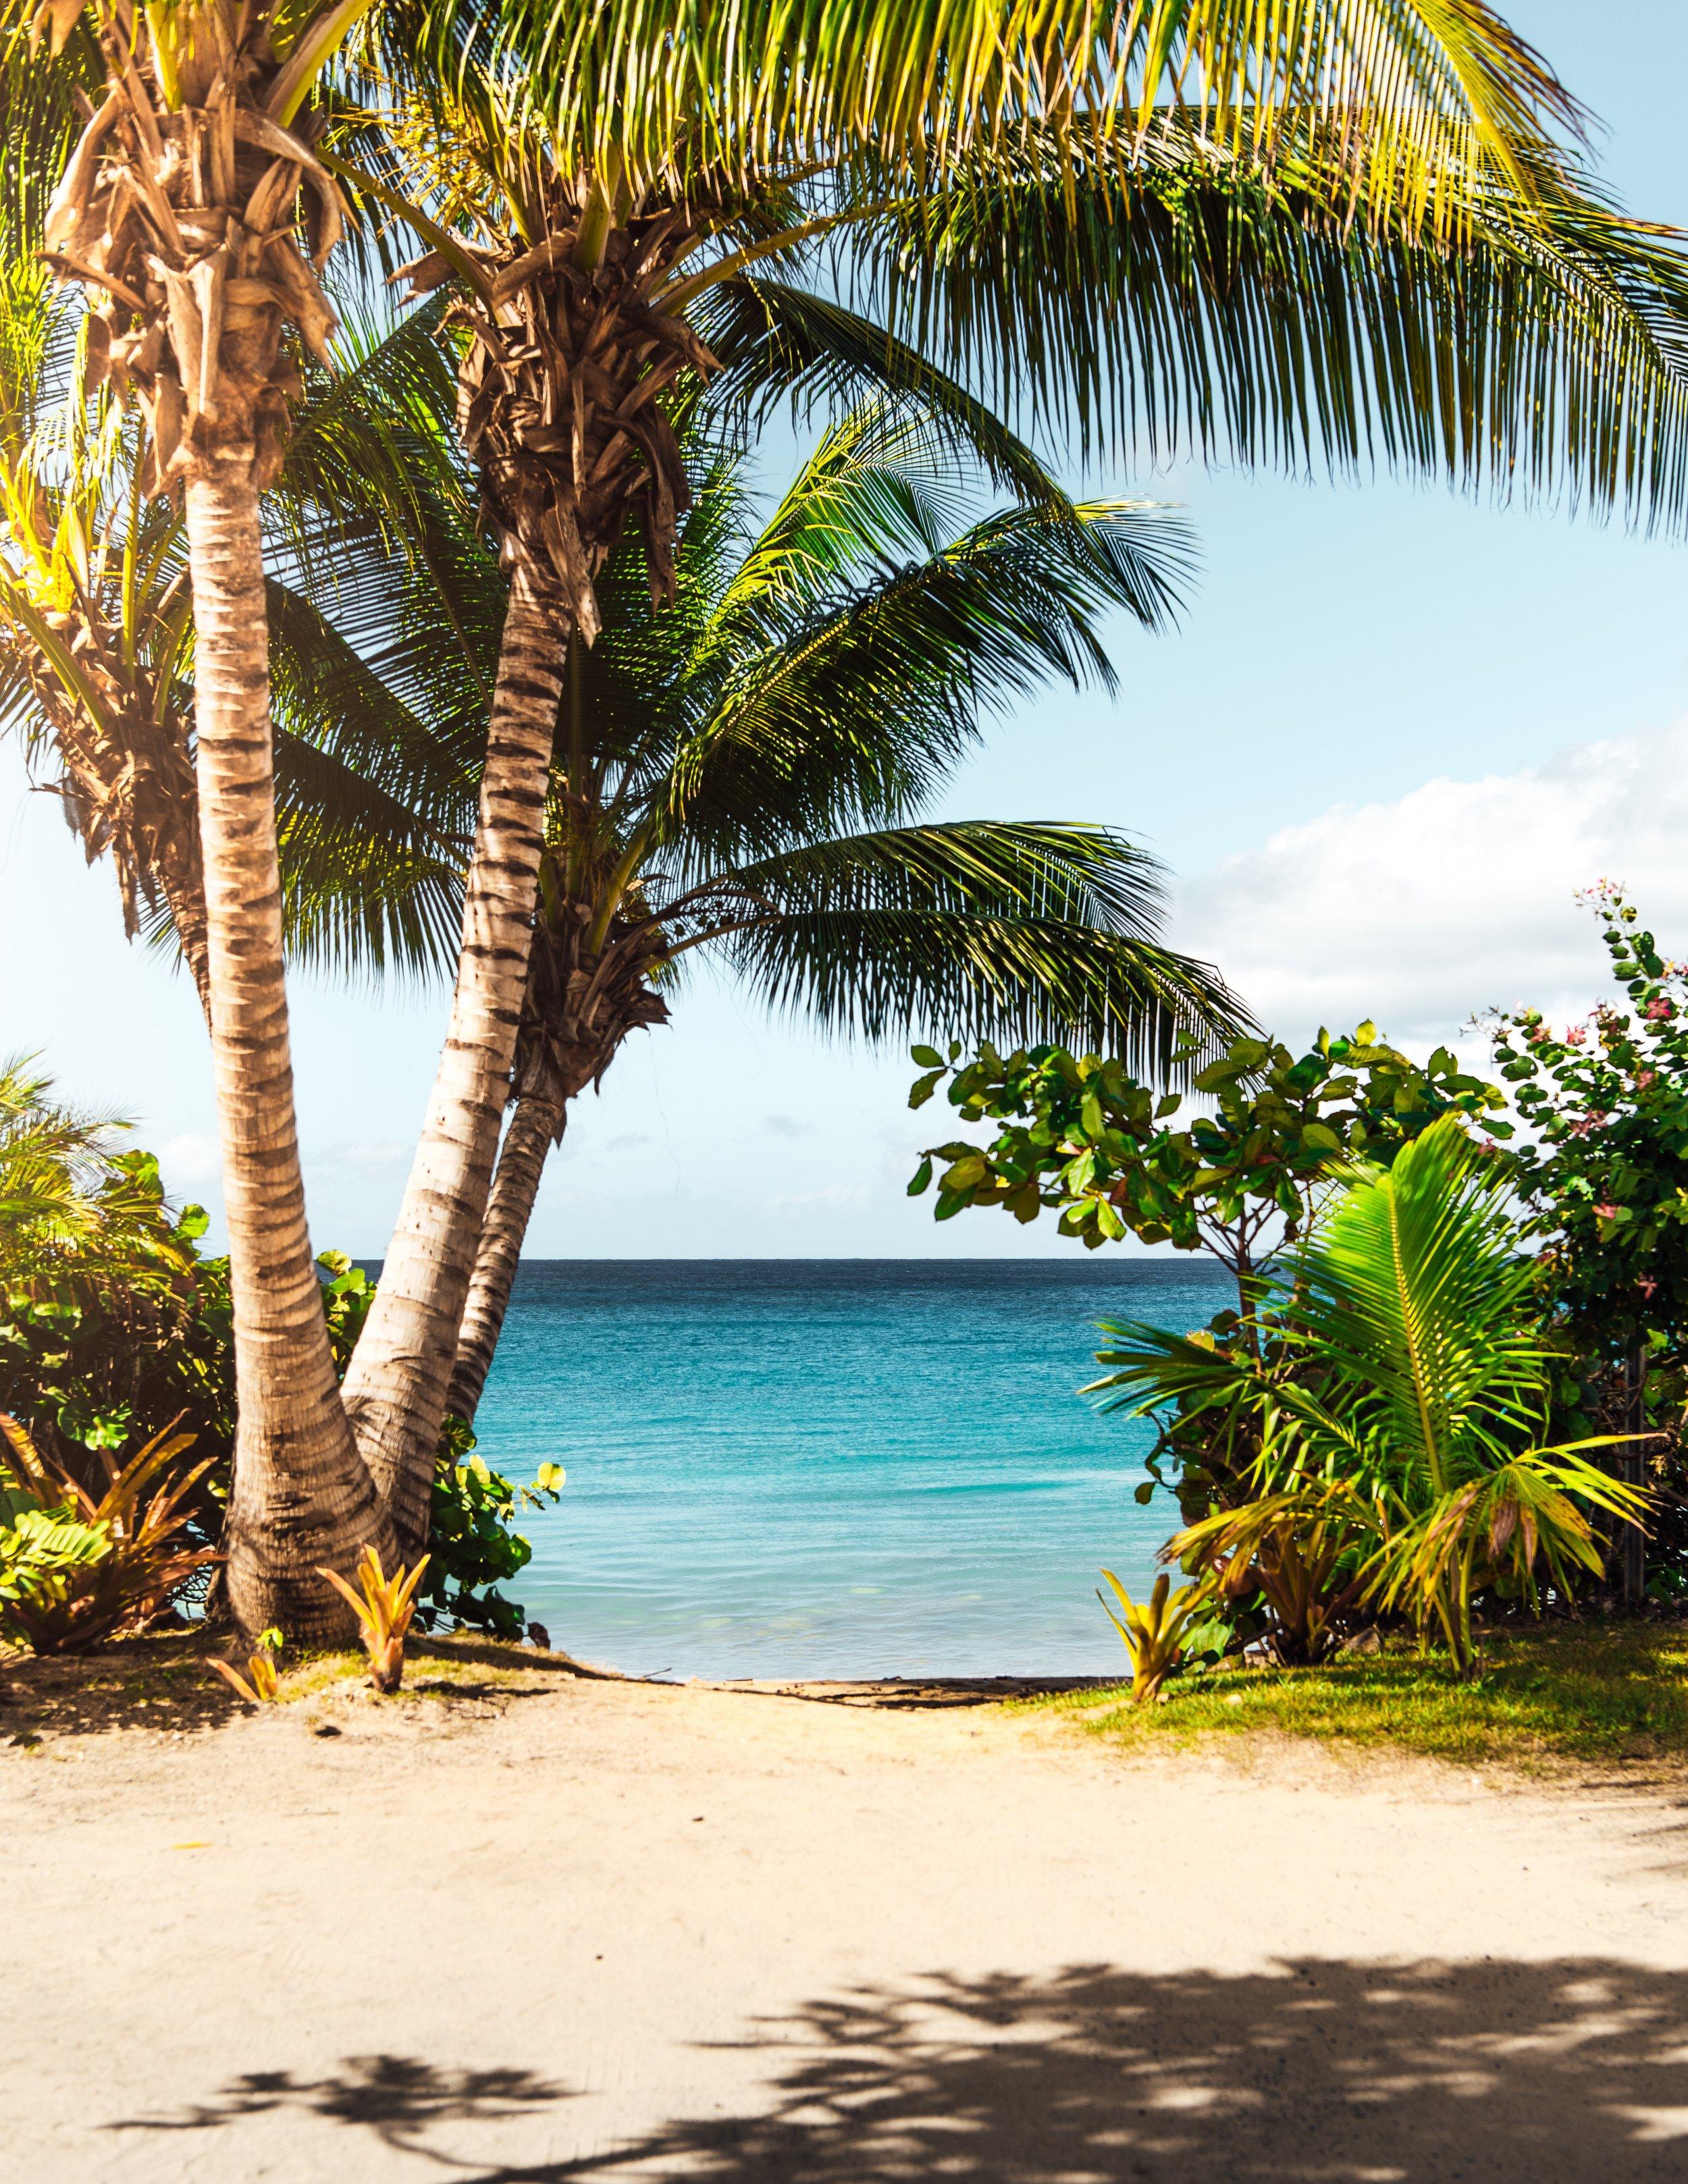 Natural Beauty - beach life